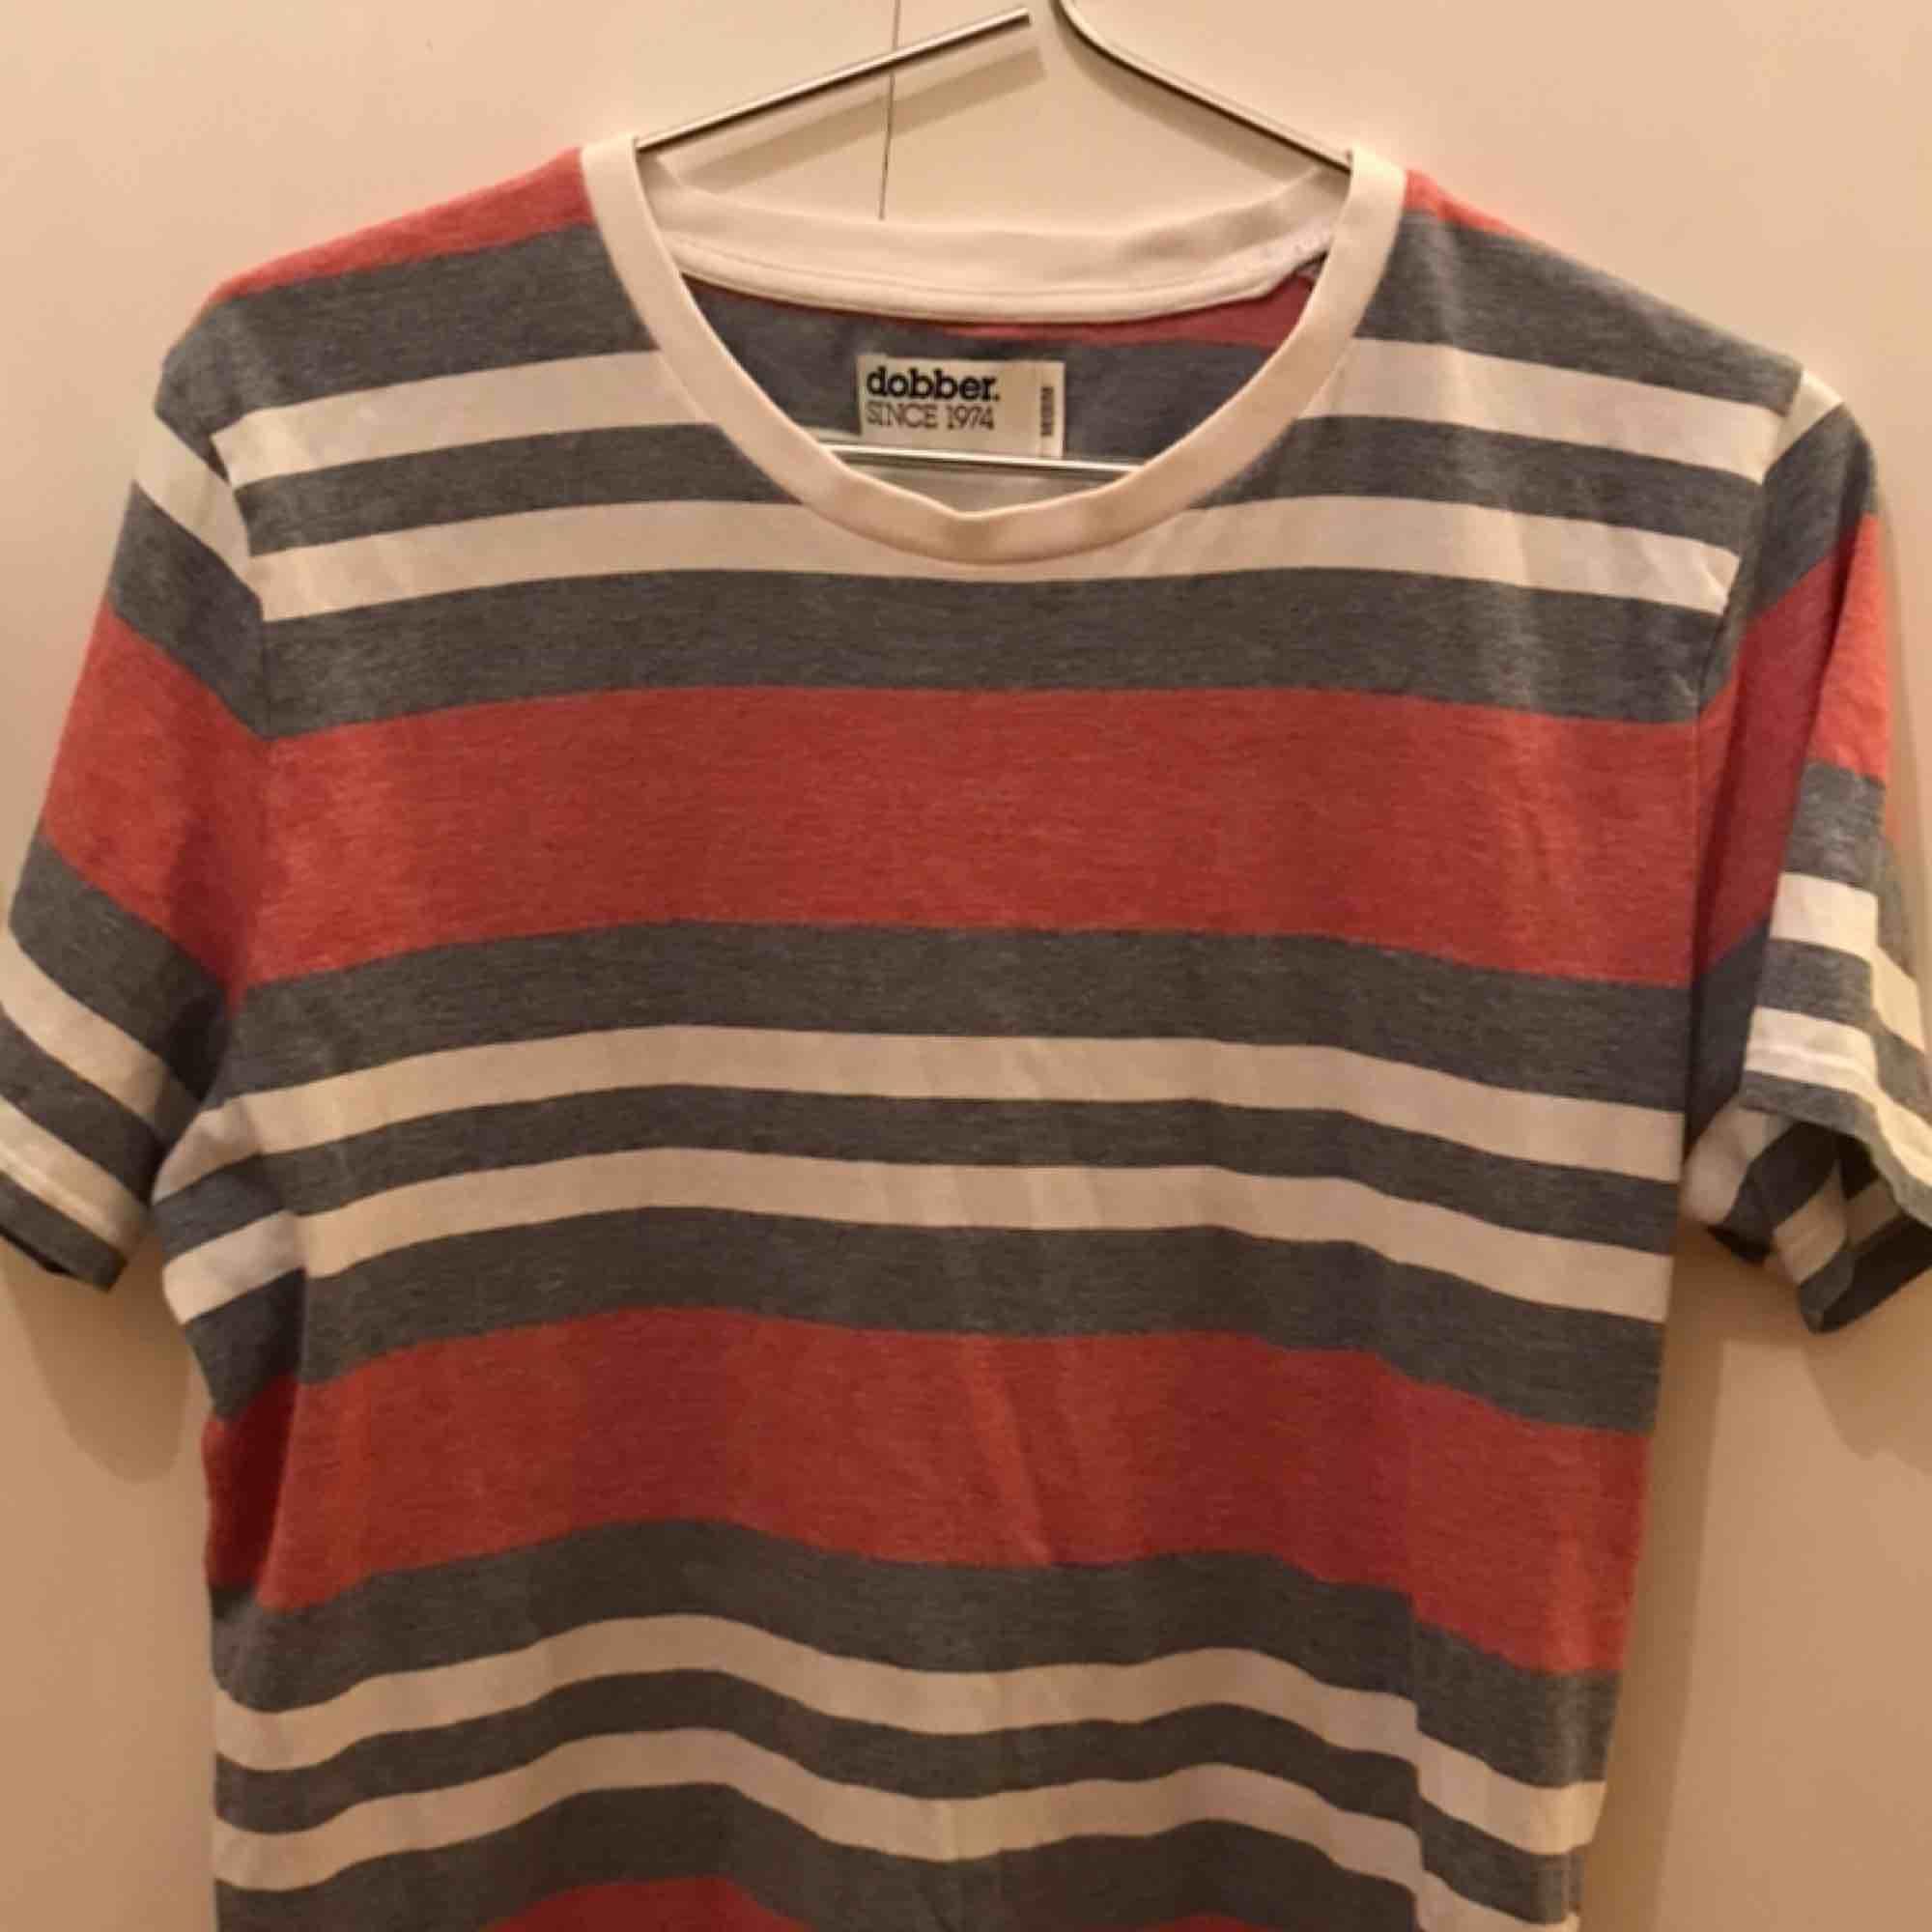 Dobber T-shirt Jätte bra skick Ej använt på länge. T-shirts.